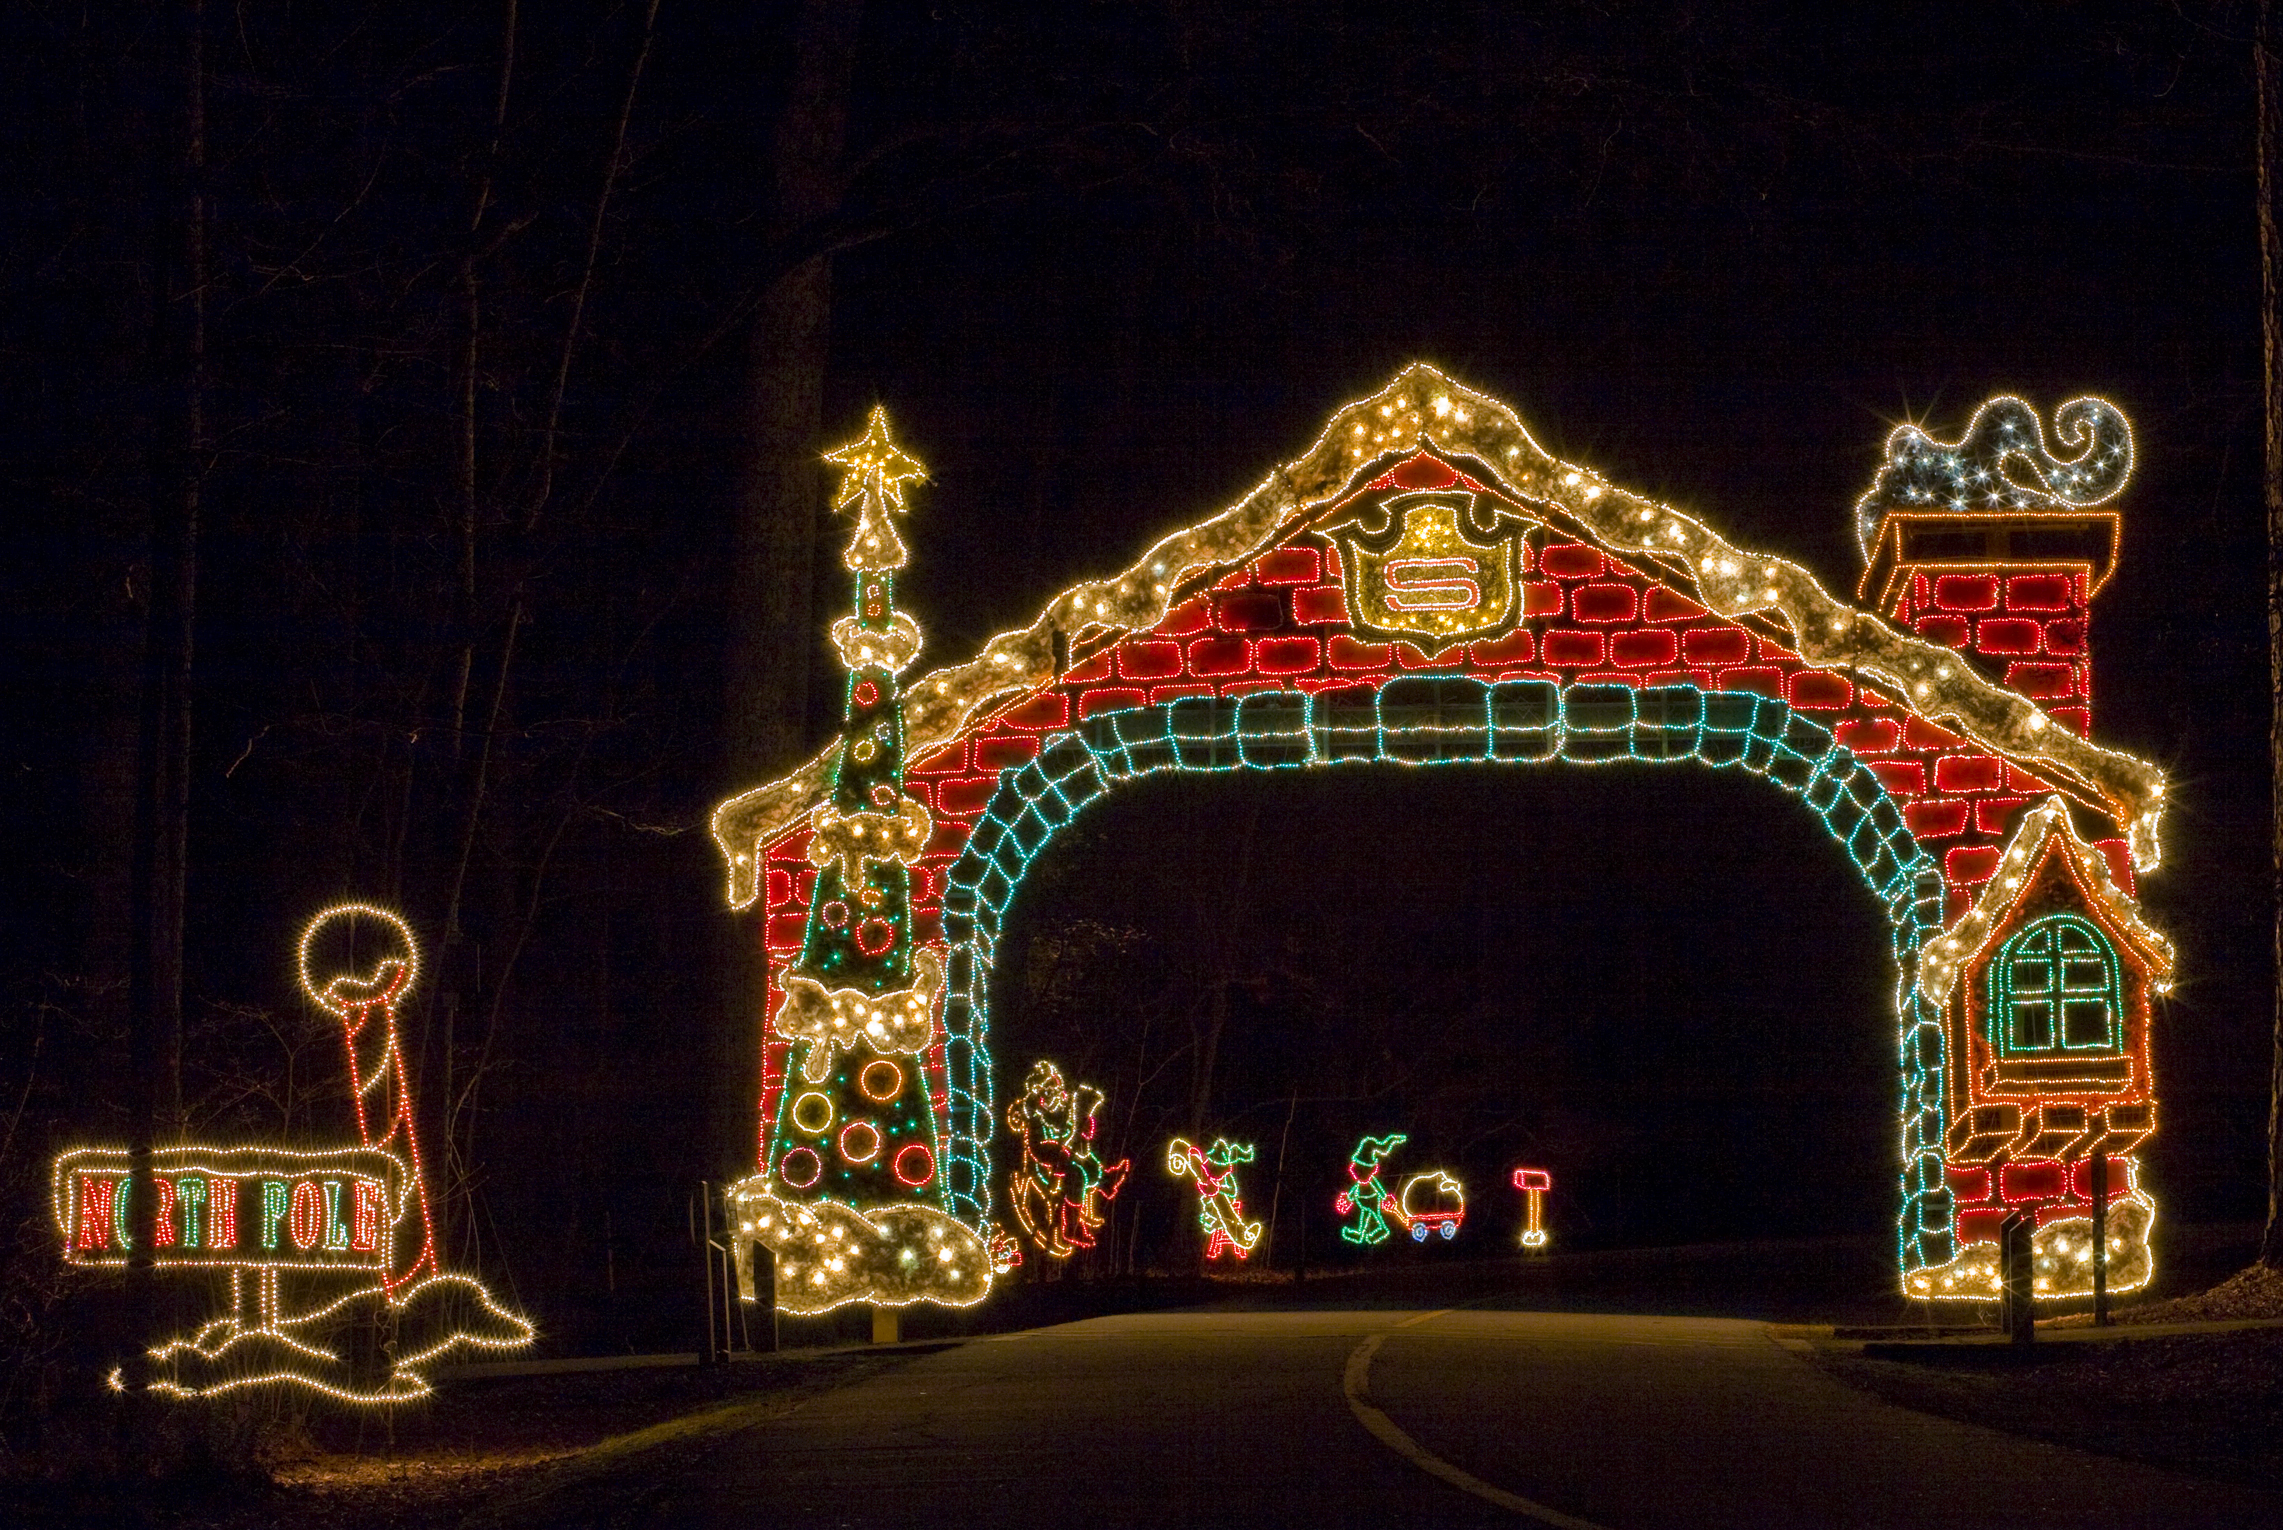 Montgomery Zoo Christmas Lights - pueblosinfronteras.us